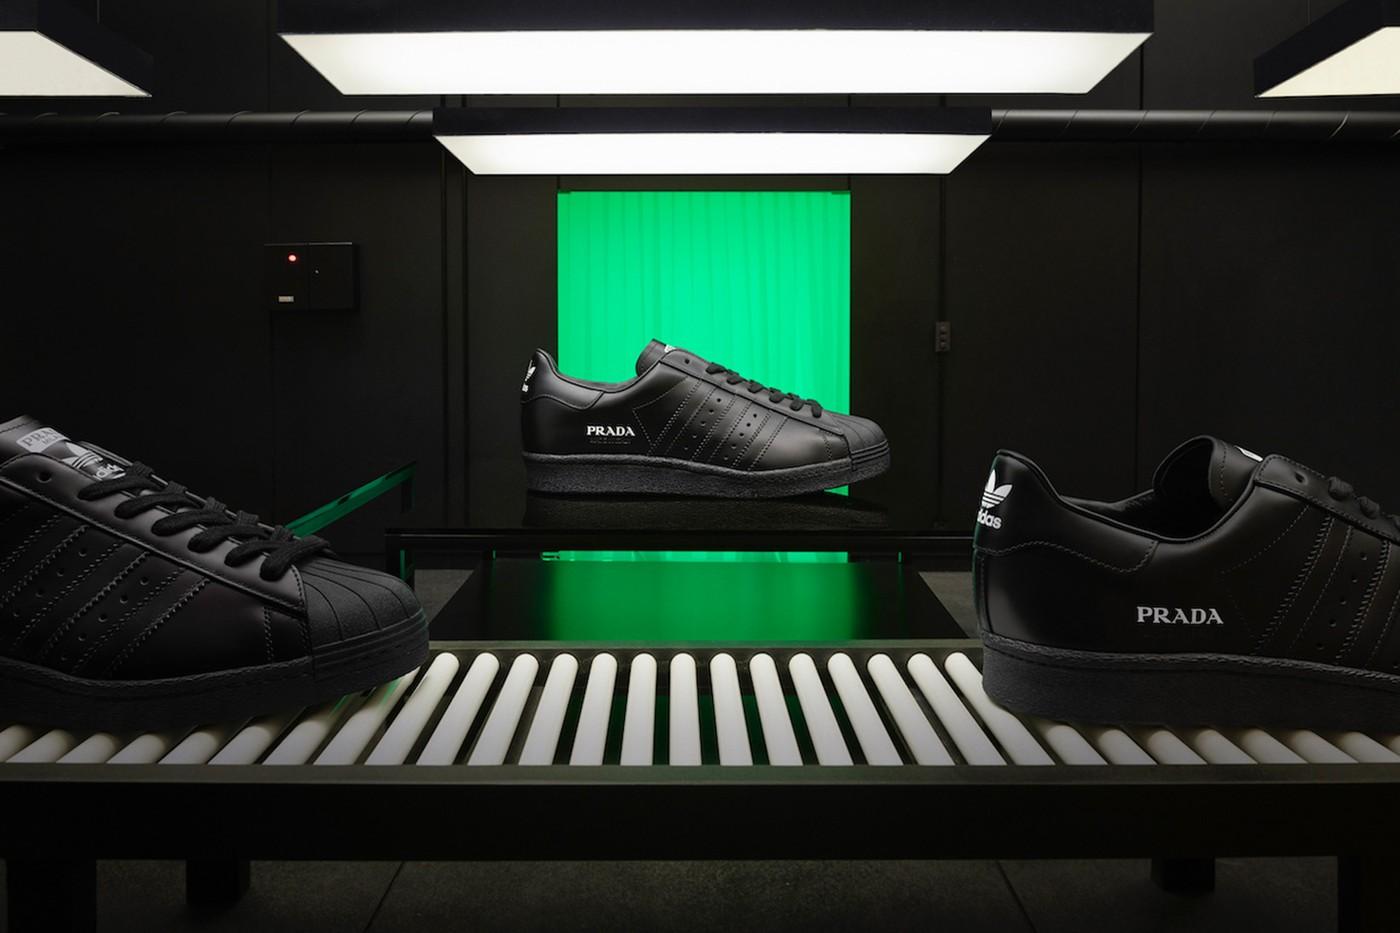 prada Adidas original superstar sneakers Collaboration 2020 release info